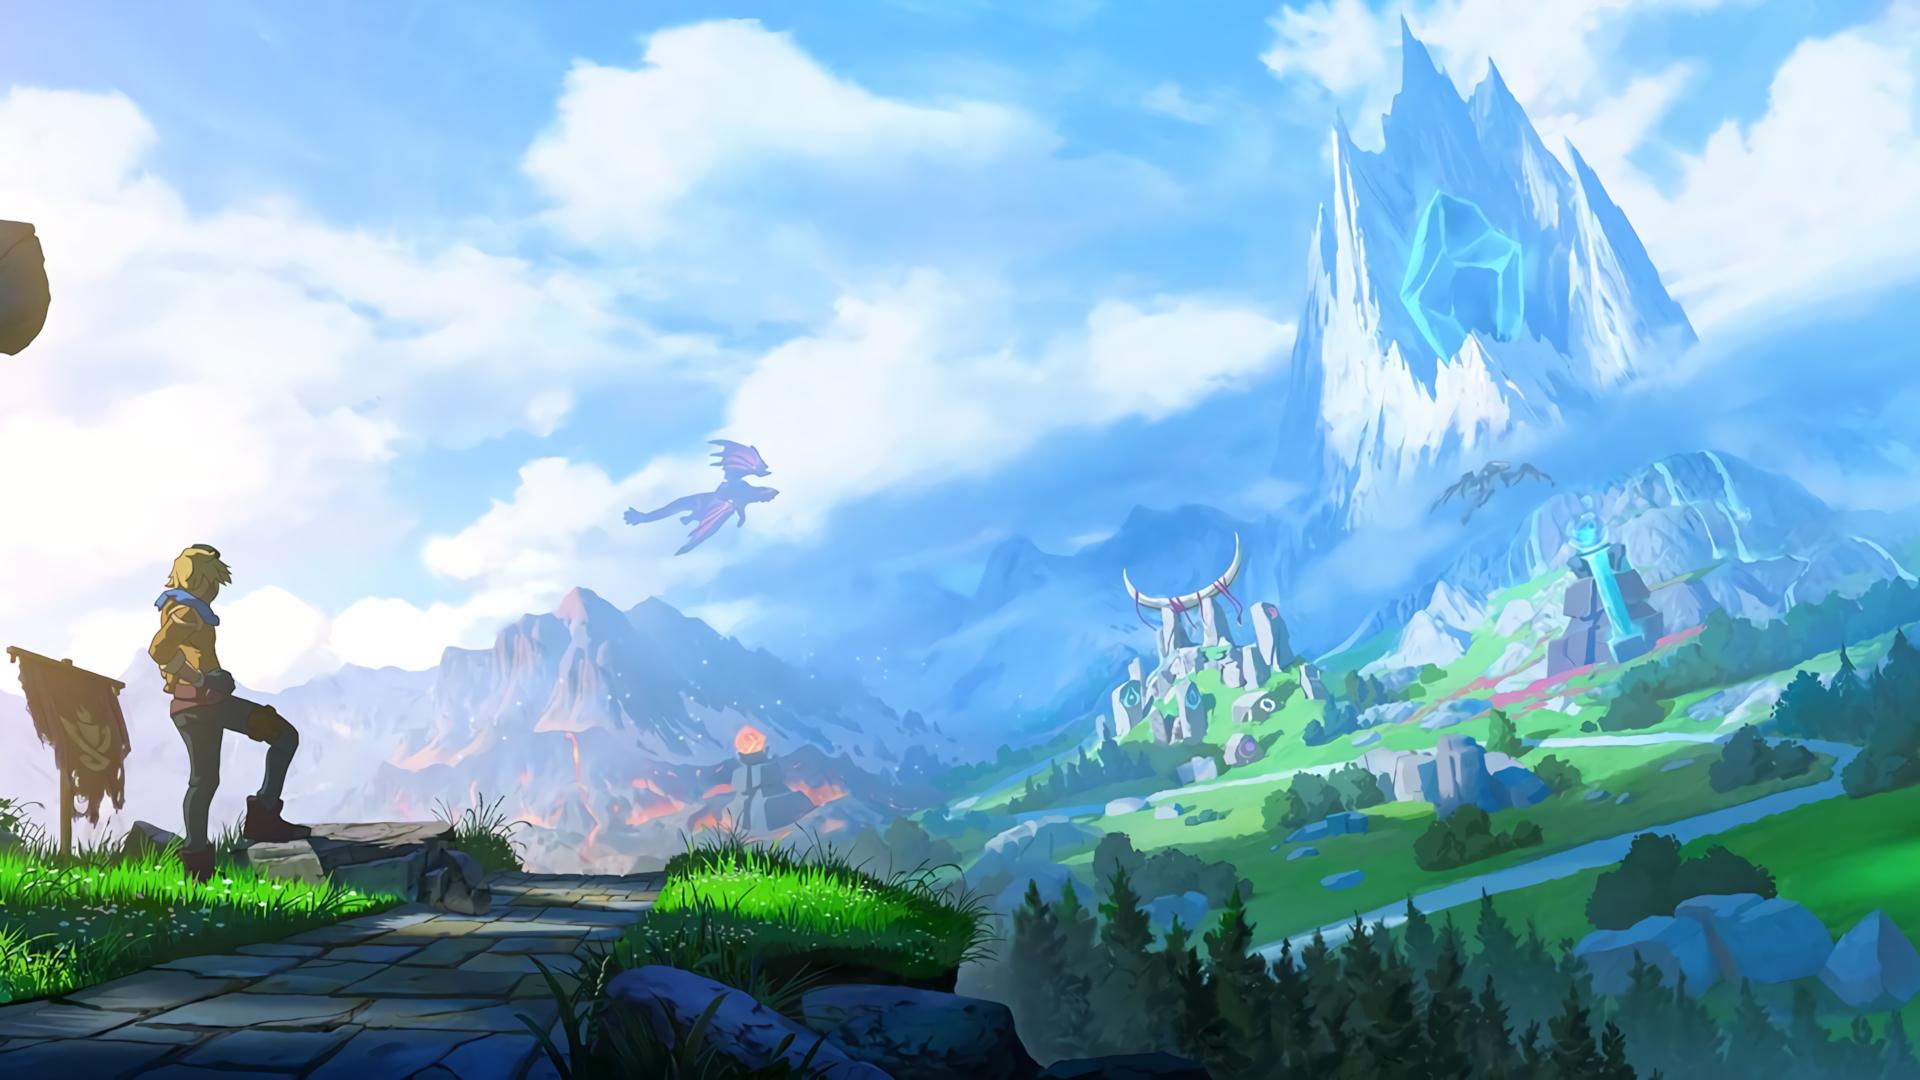 Cool 4k Legend of Zelda wallpapers nintendo switch desktop background hd image